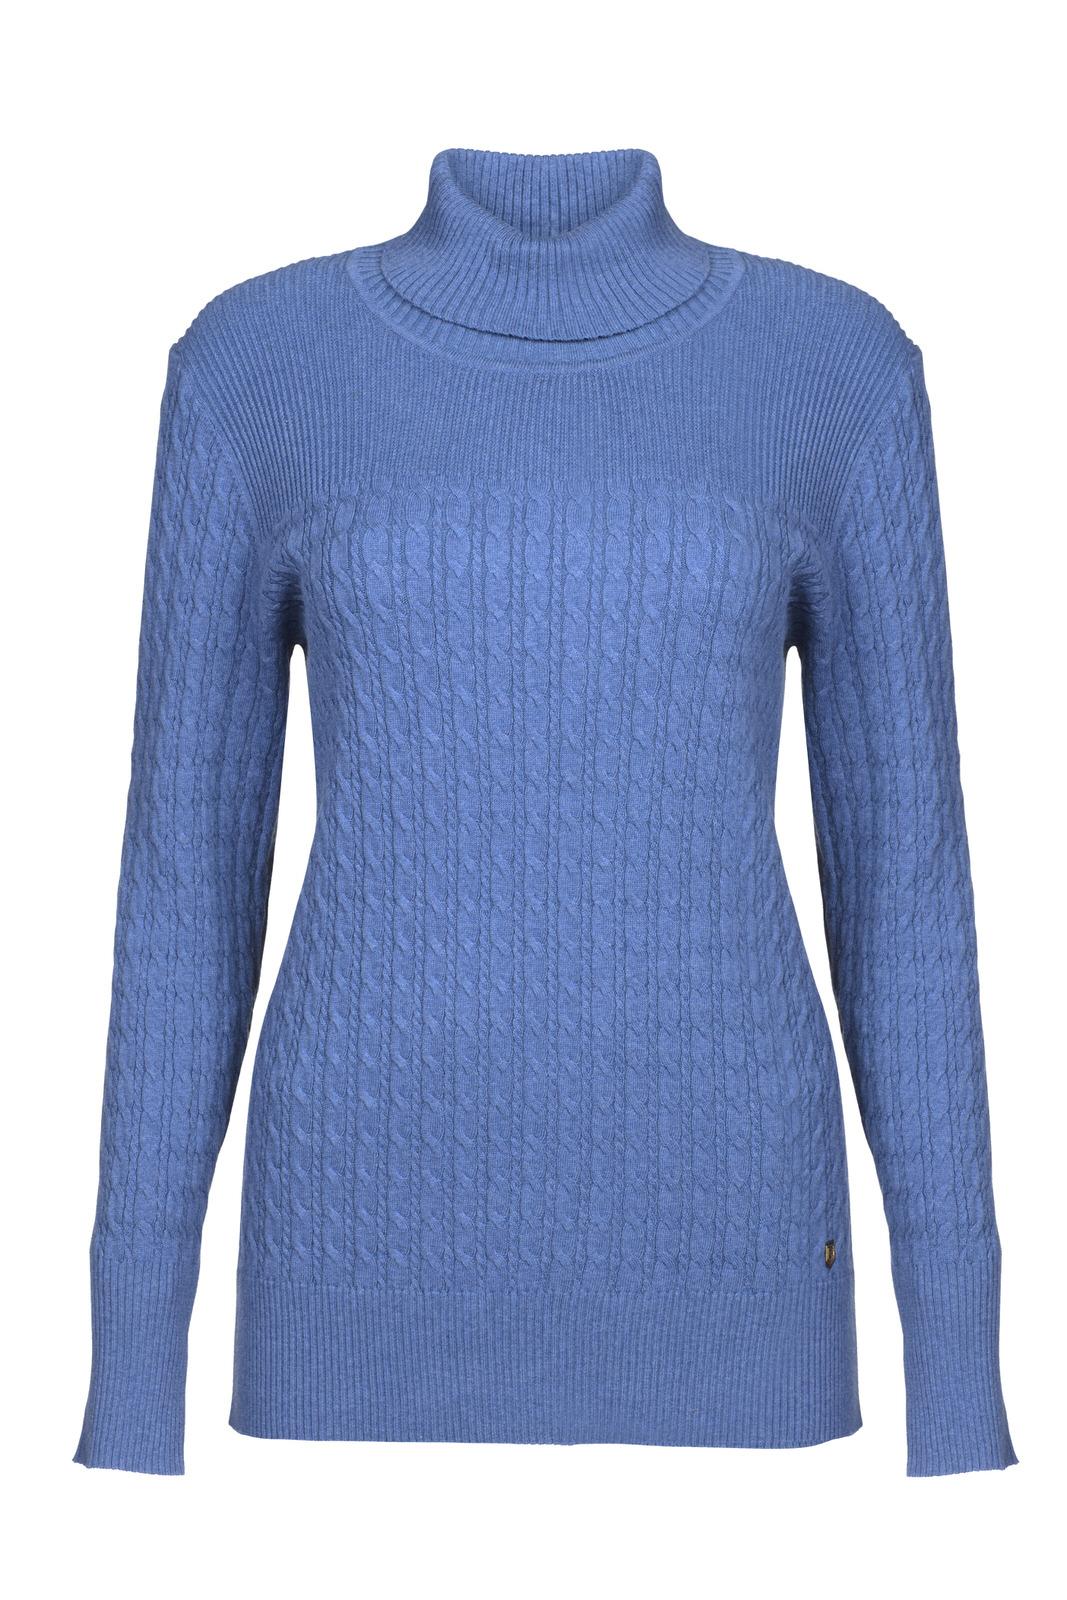 Dubarry_ Boylan Polo Neck Sweater - Denim_Image_2